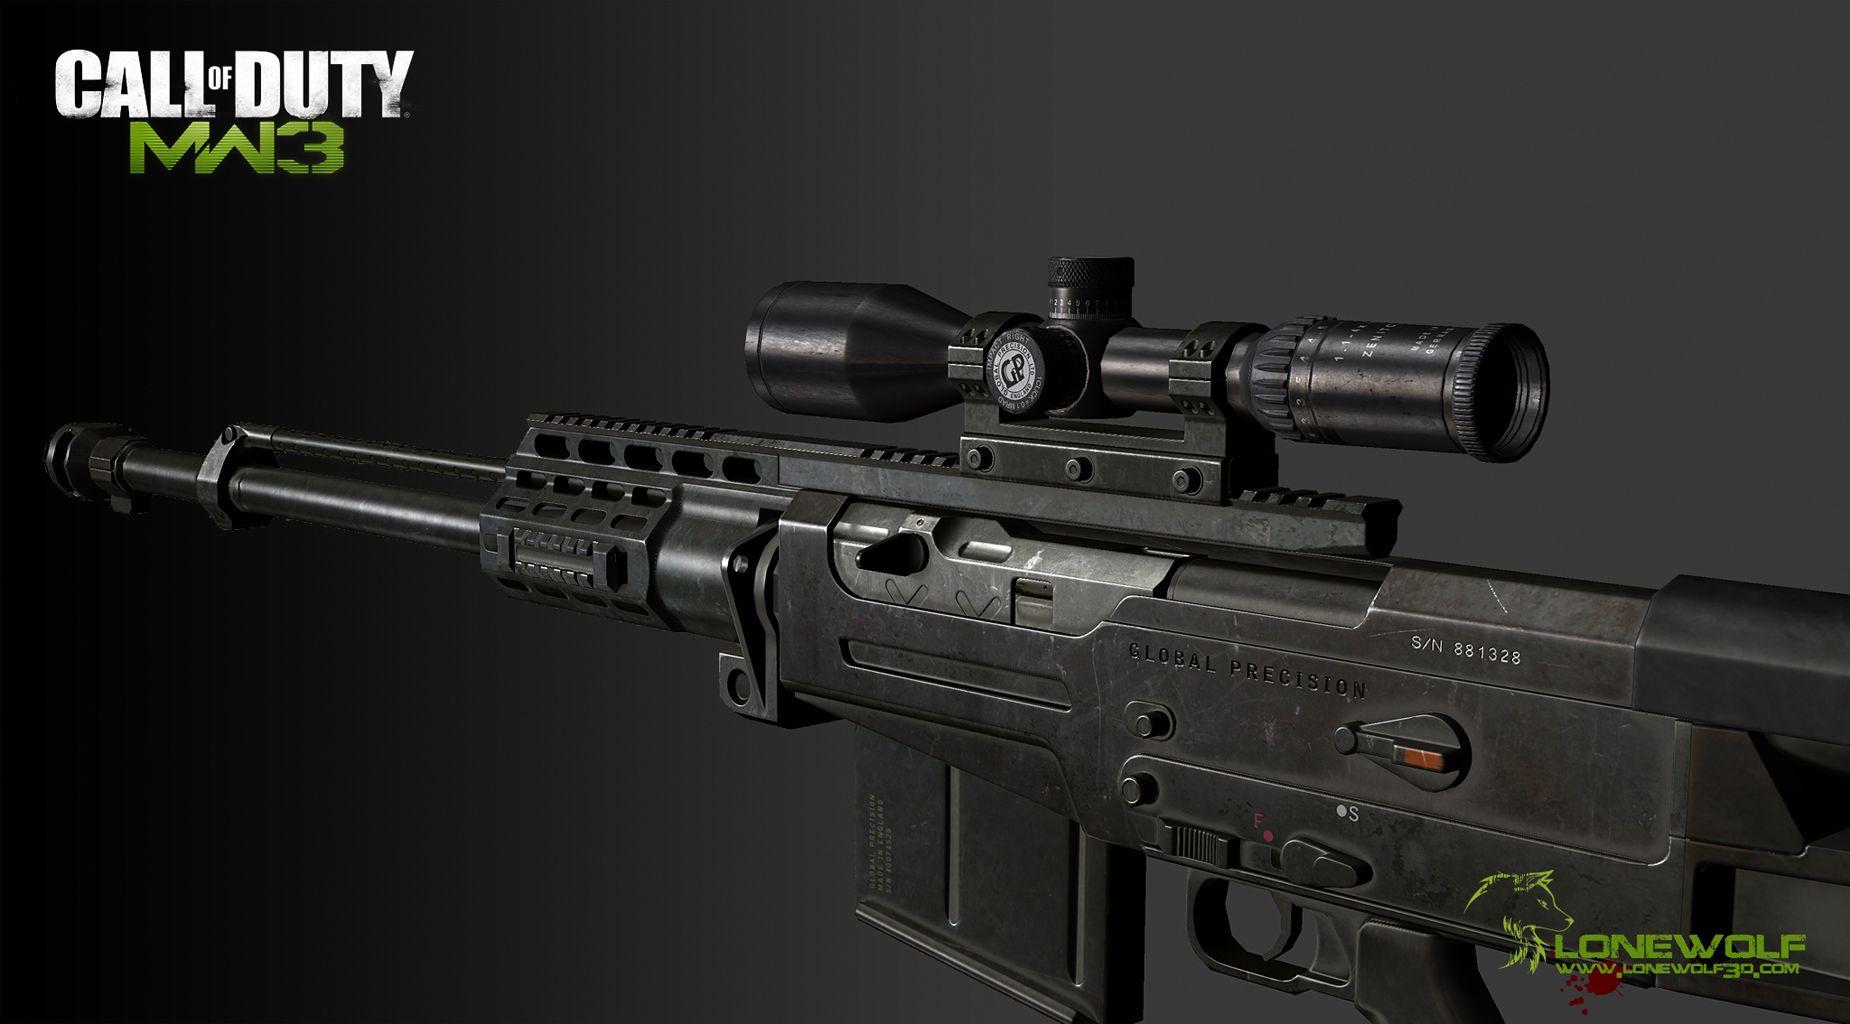 Call of duty modern warfare 2 gun - Call Of Duty Modern Warfare 3 Weapons Weapons Pinterest Modern Warfare And Weapons